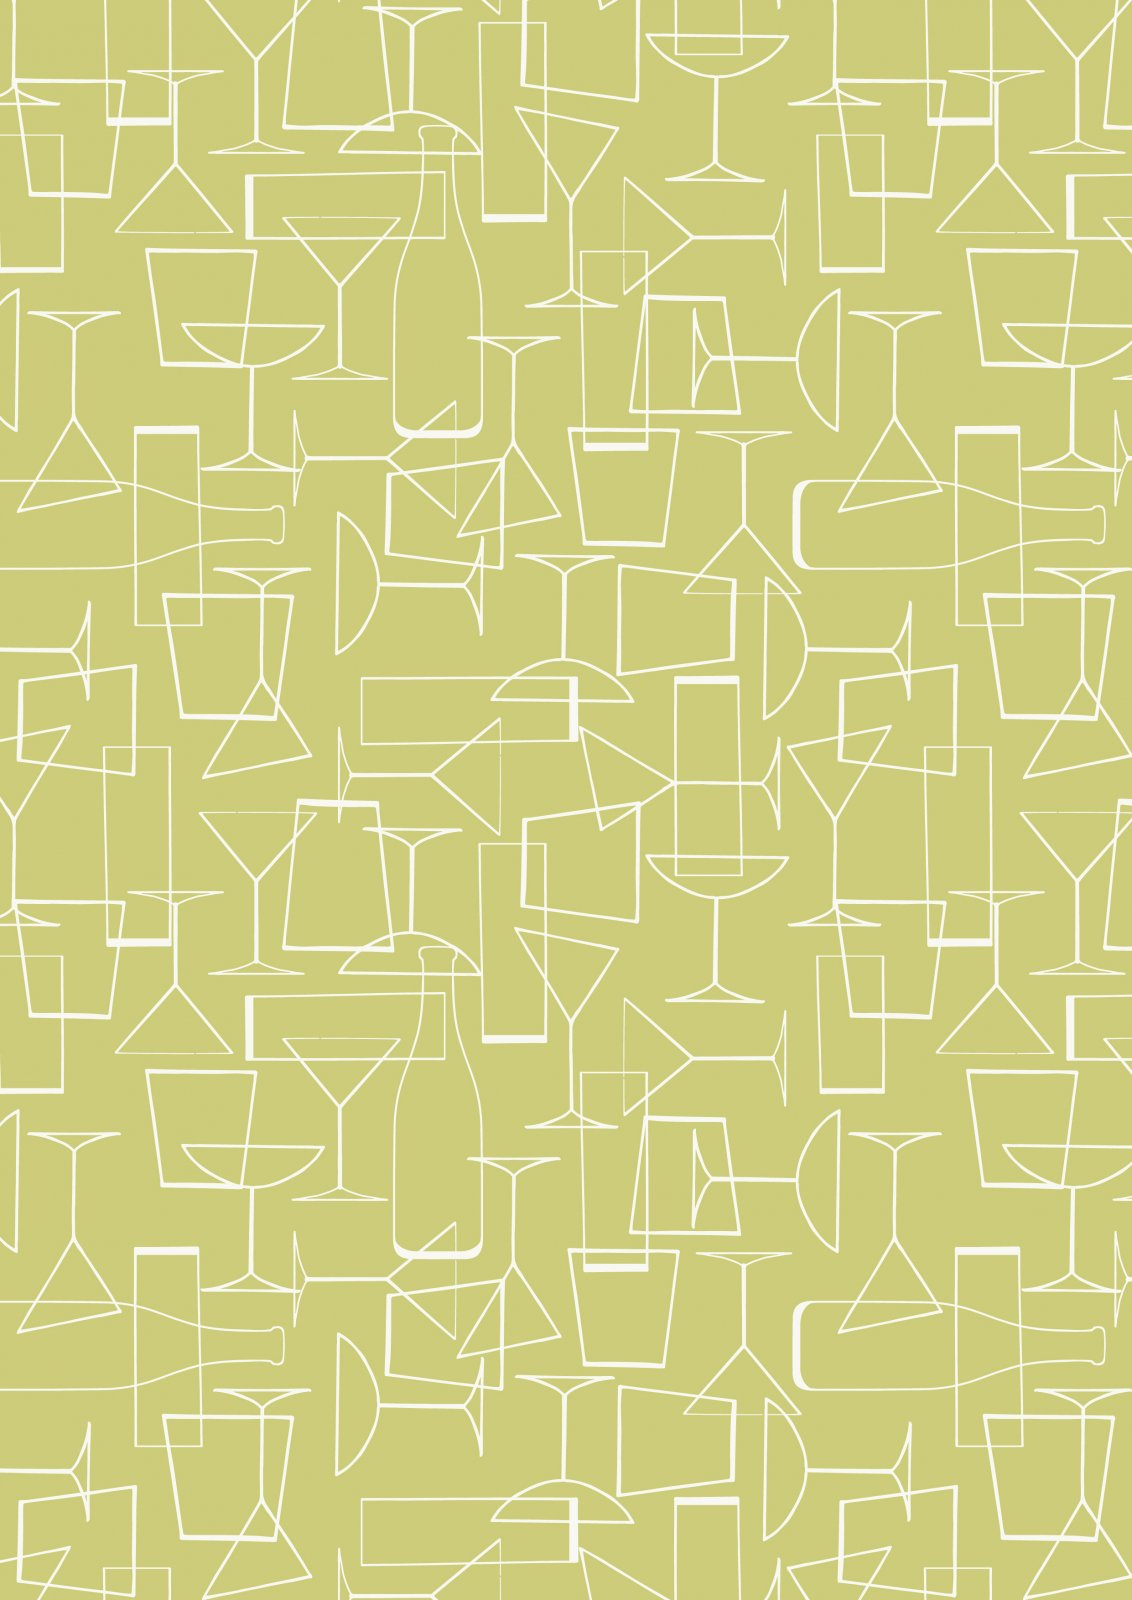 Cocktail Party - C#2 A351